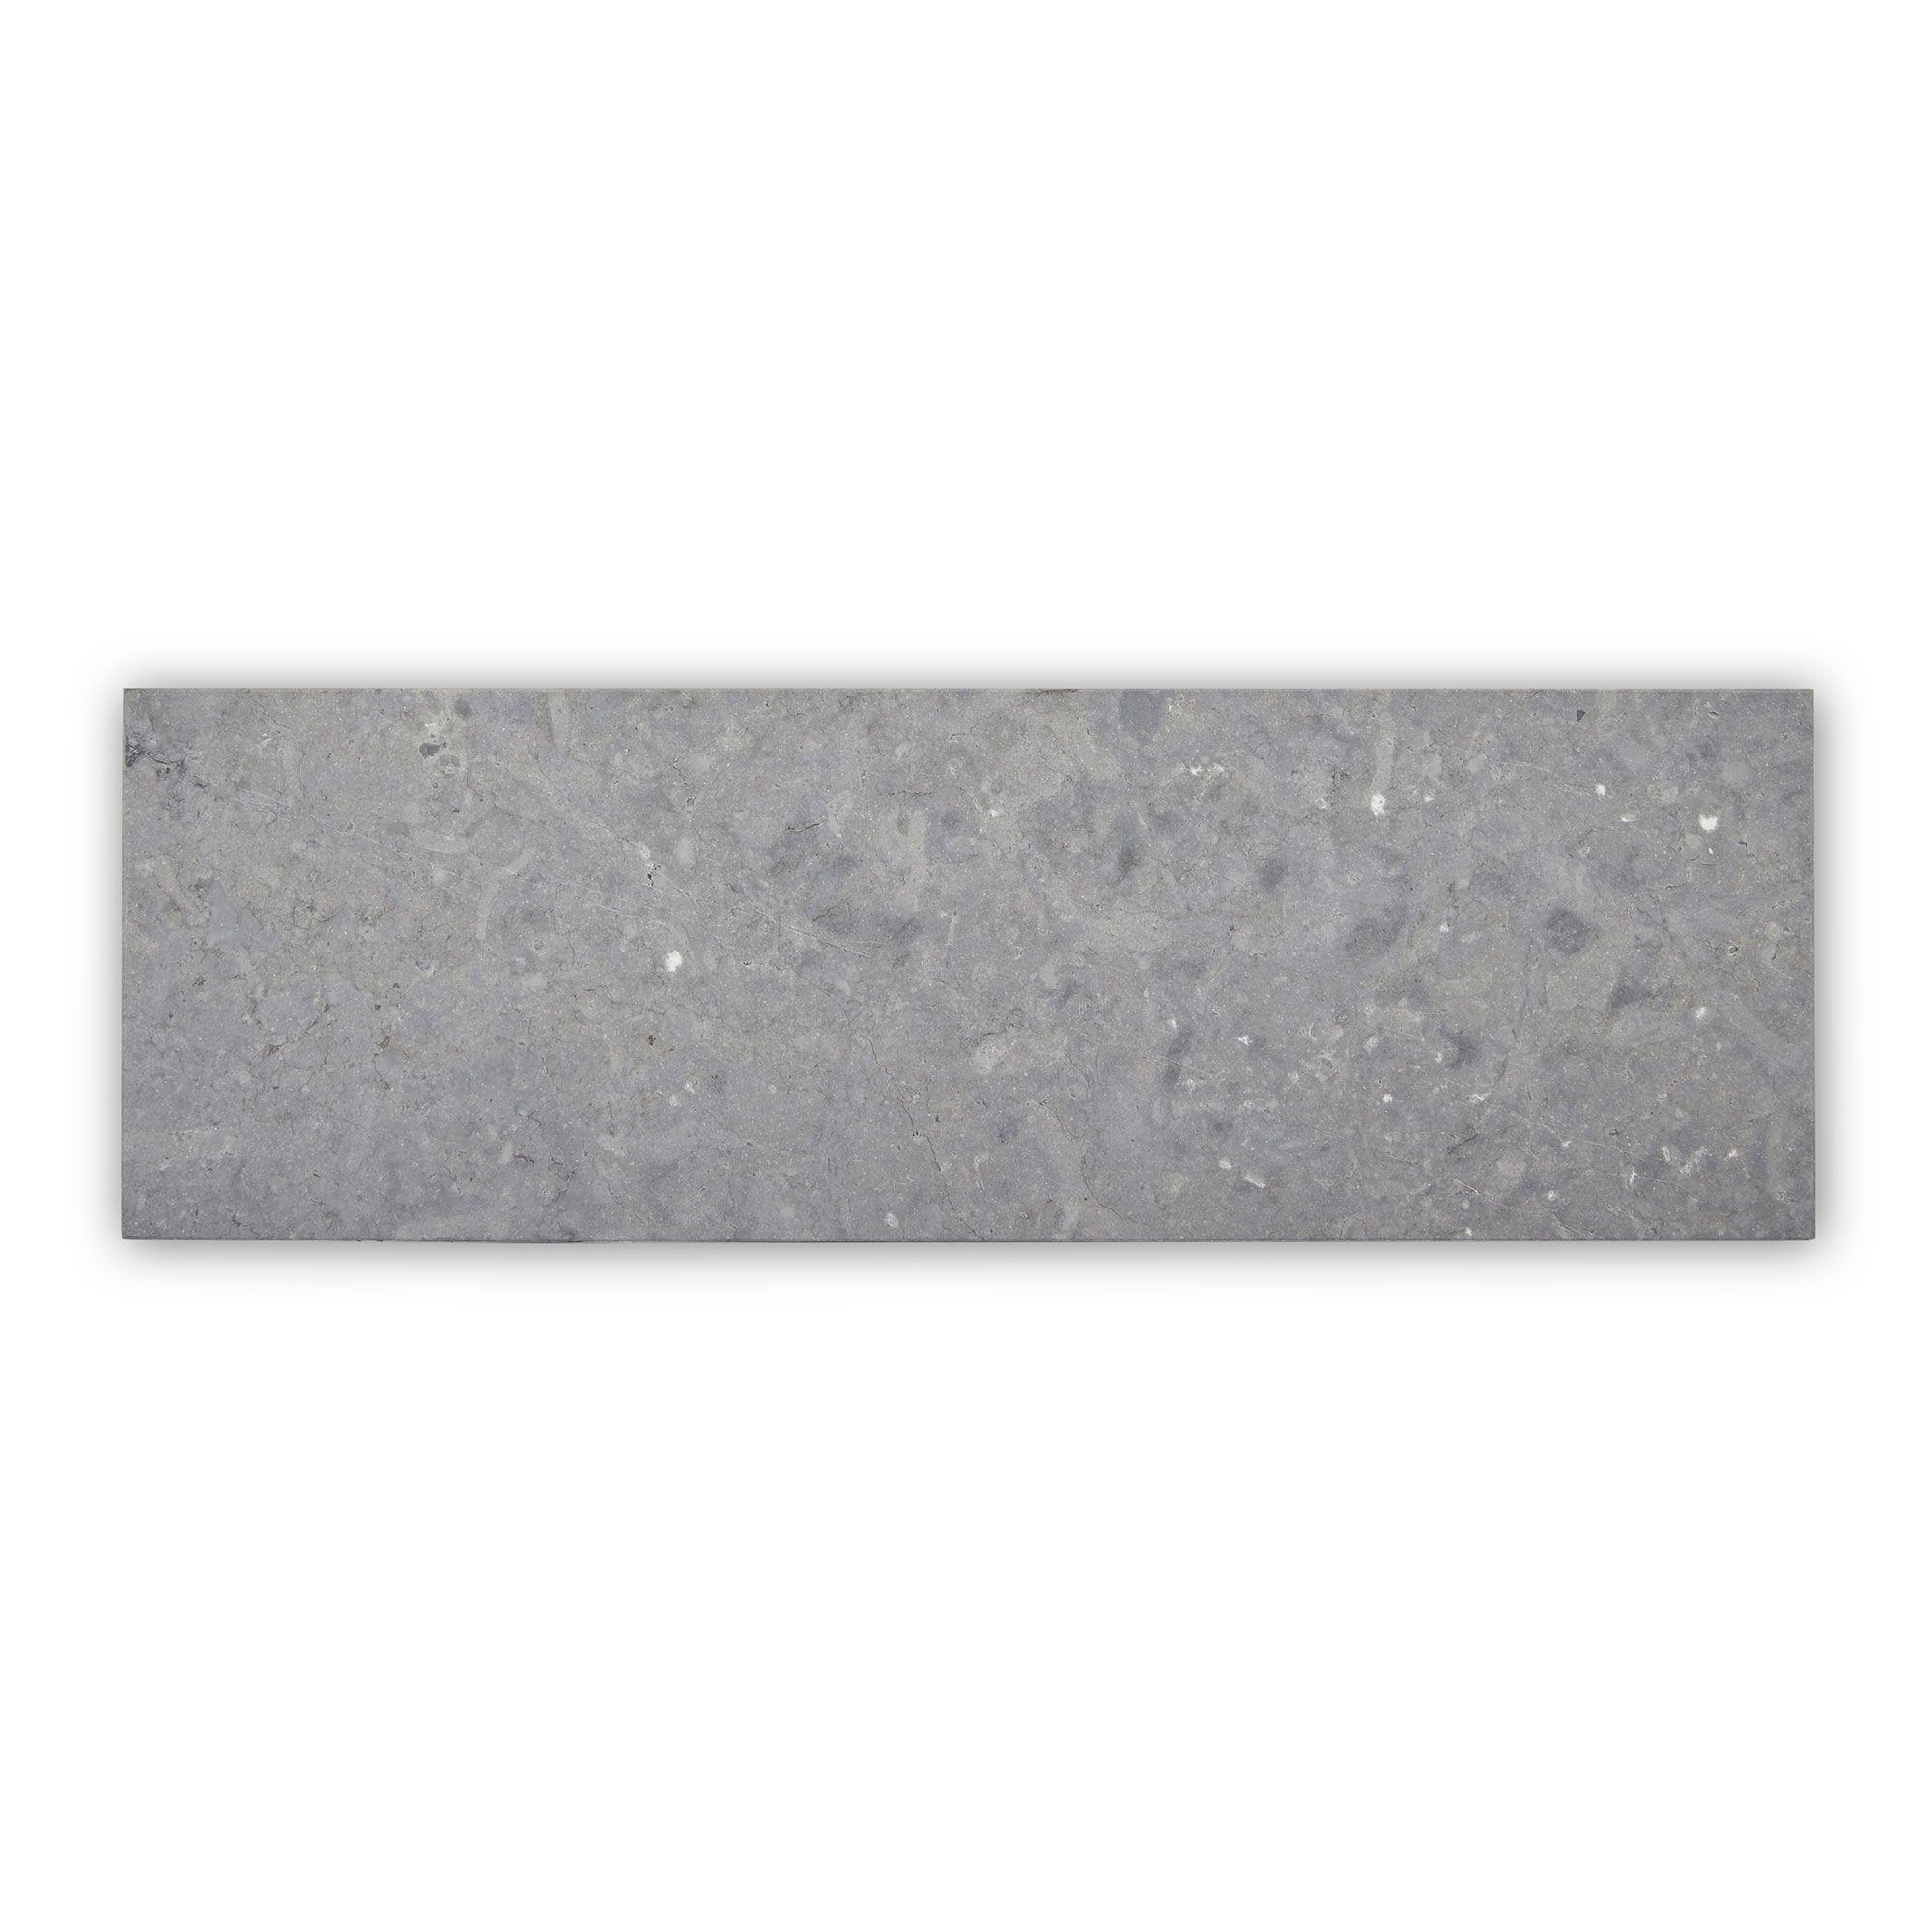 Hampton Bays 10x30 Diamond Sawn, Honed